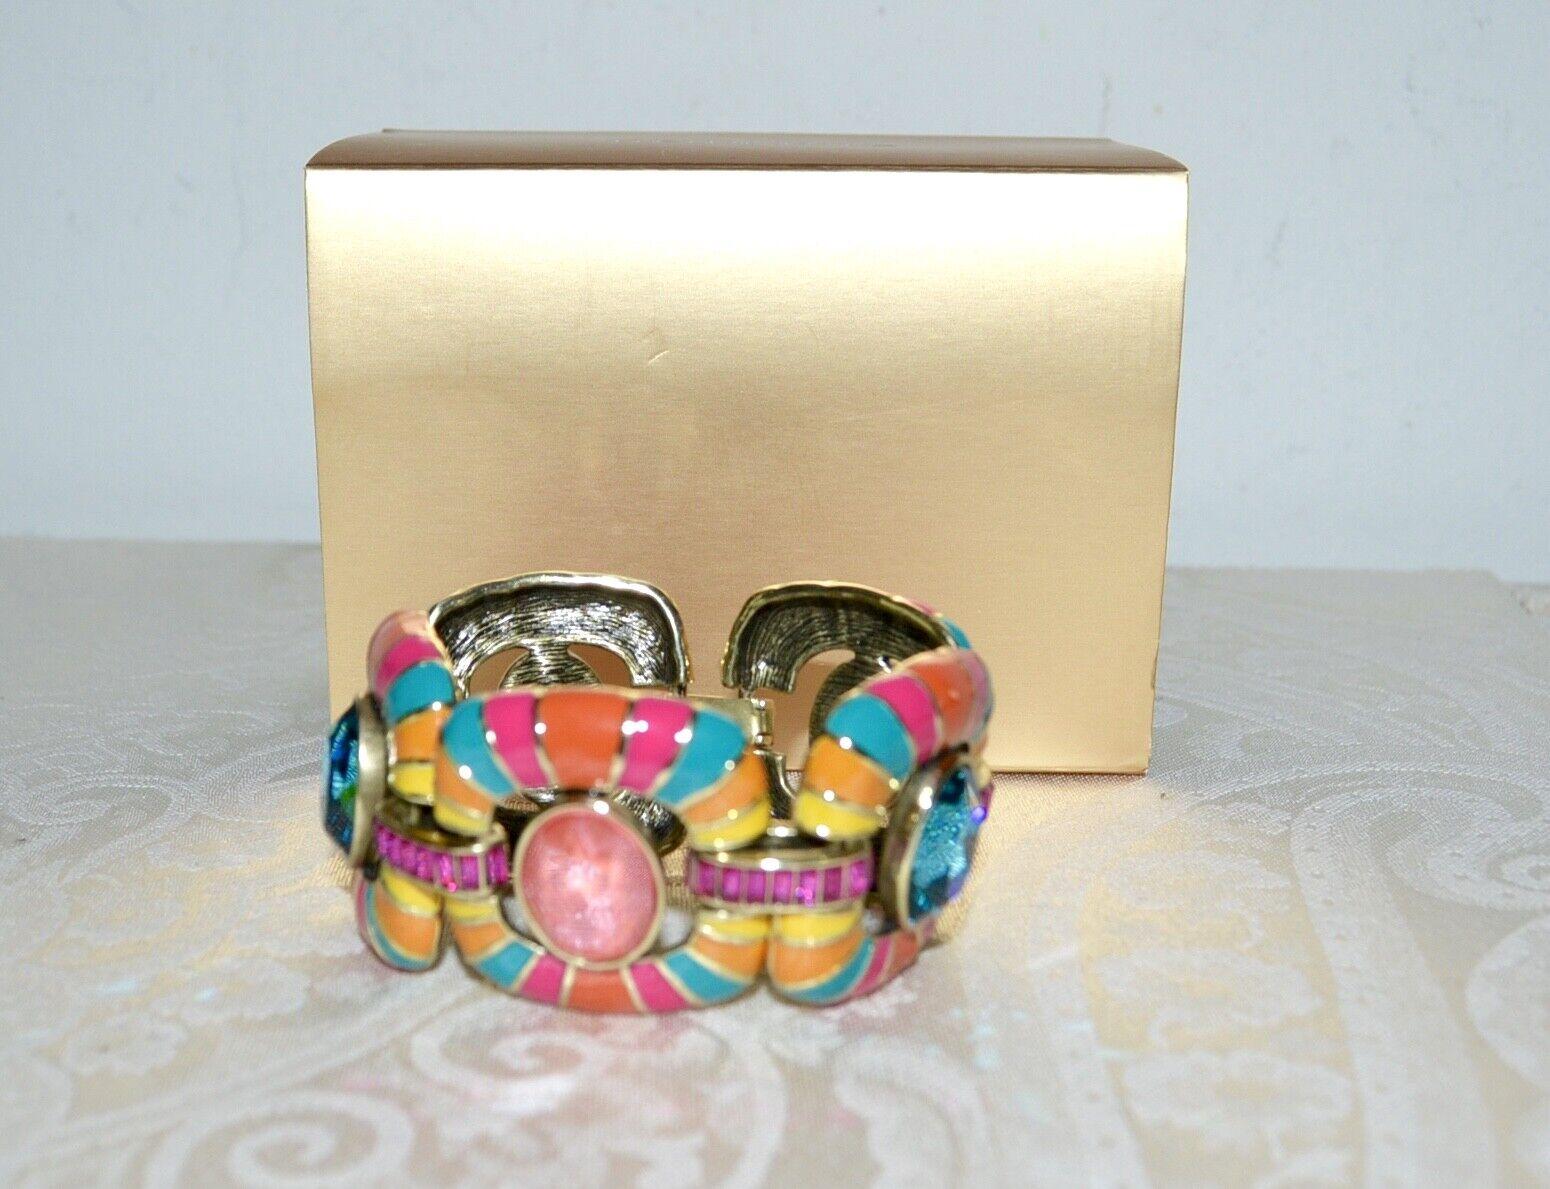 New  240 HEIDI DAUS  Park Avenue South  Link Bracelet Enamel Crystals